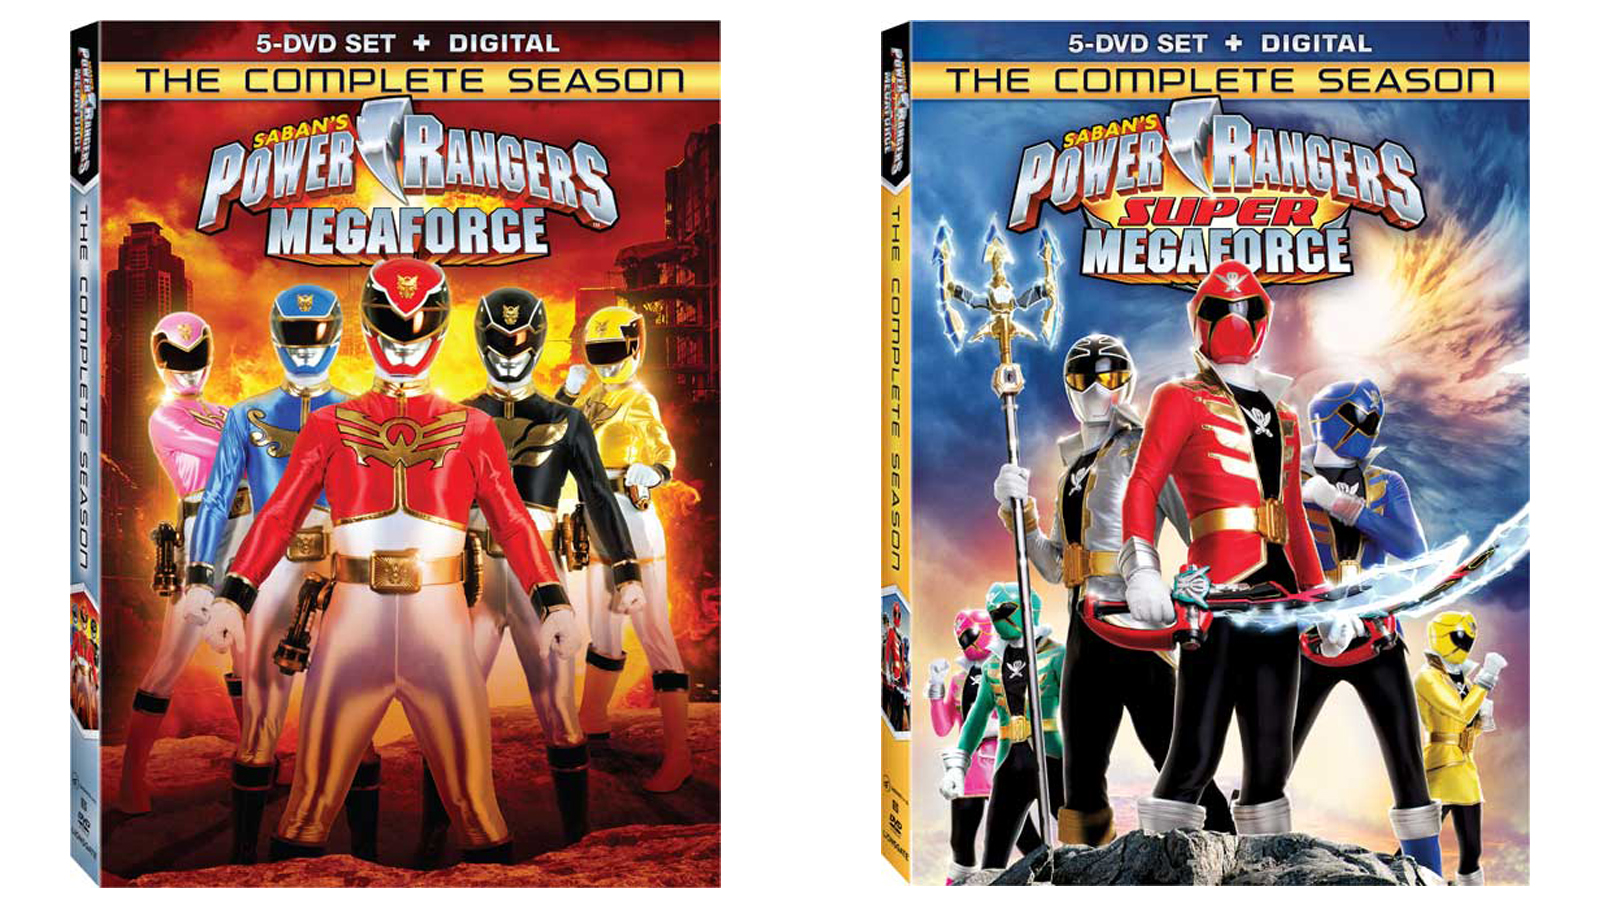 Power Rangers Megaforce Super Megaforce Complete Season Dvds